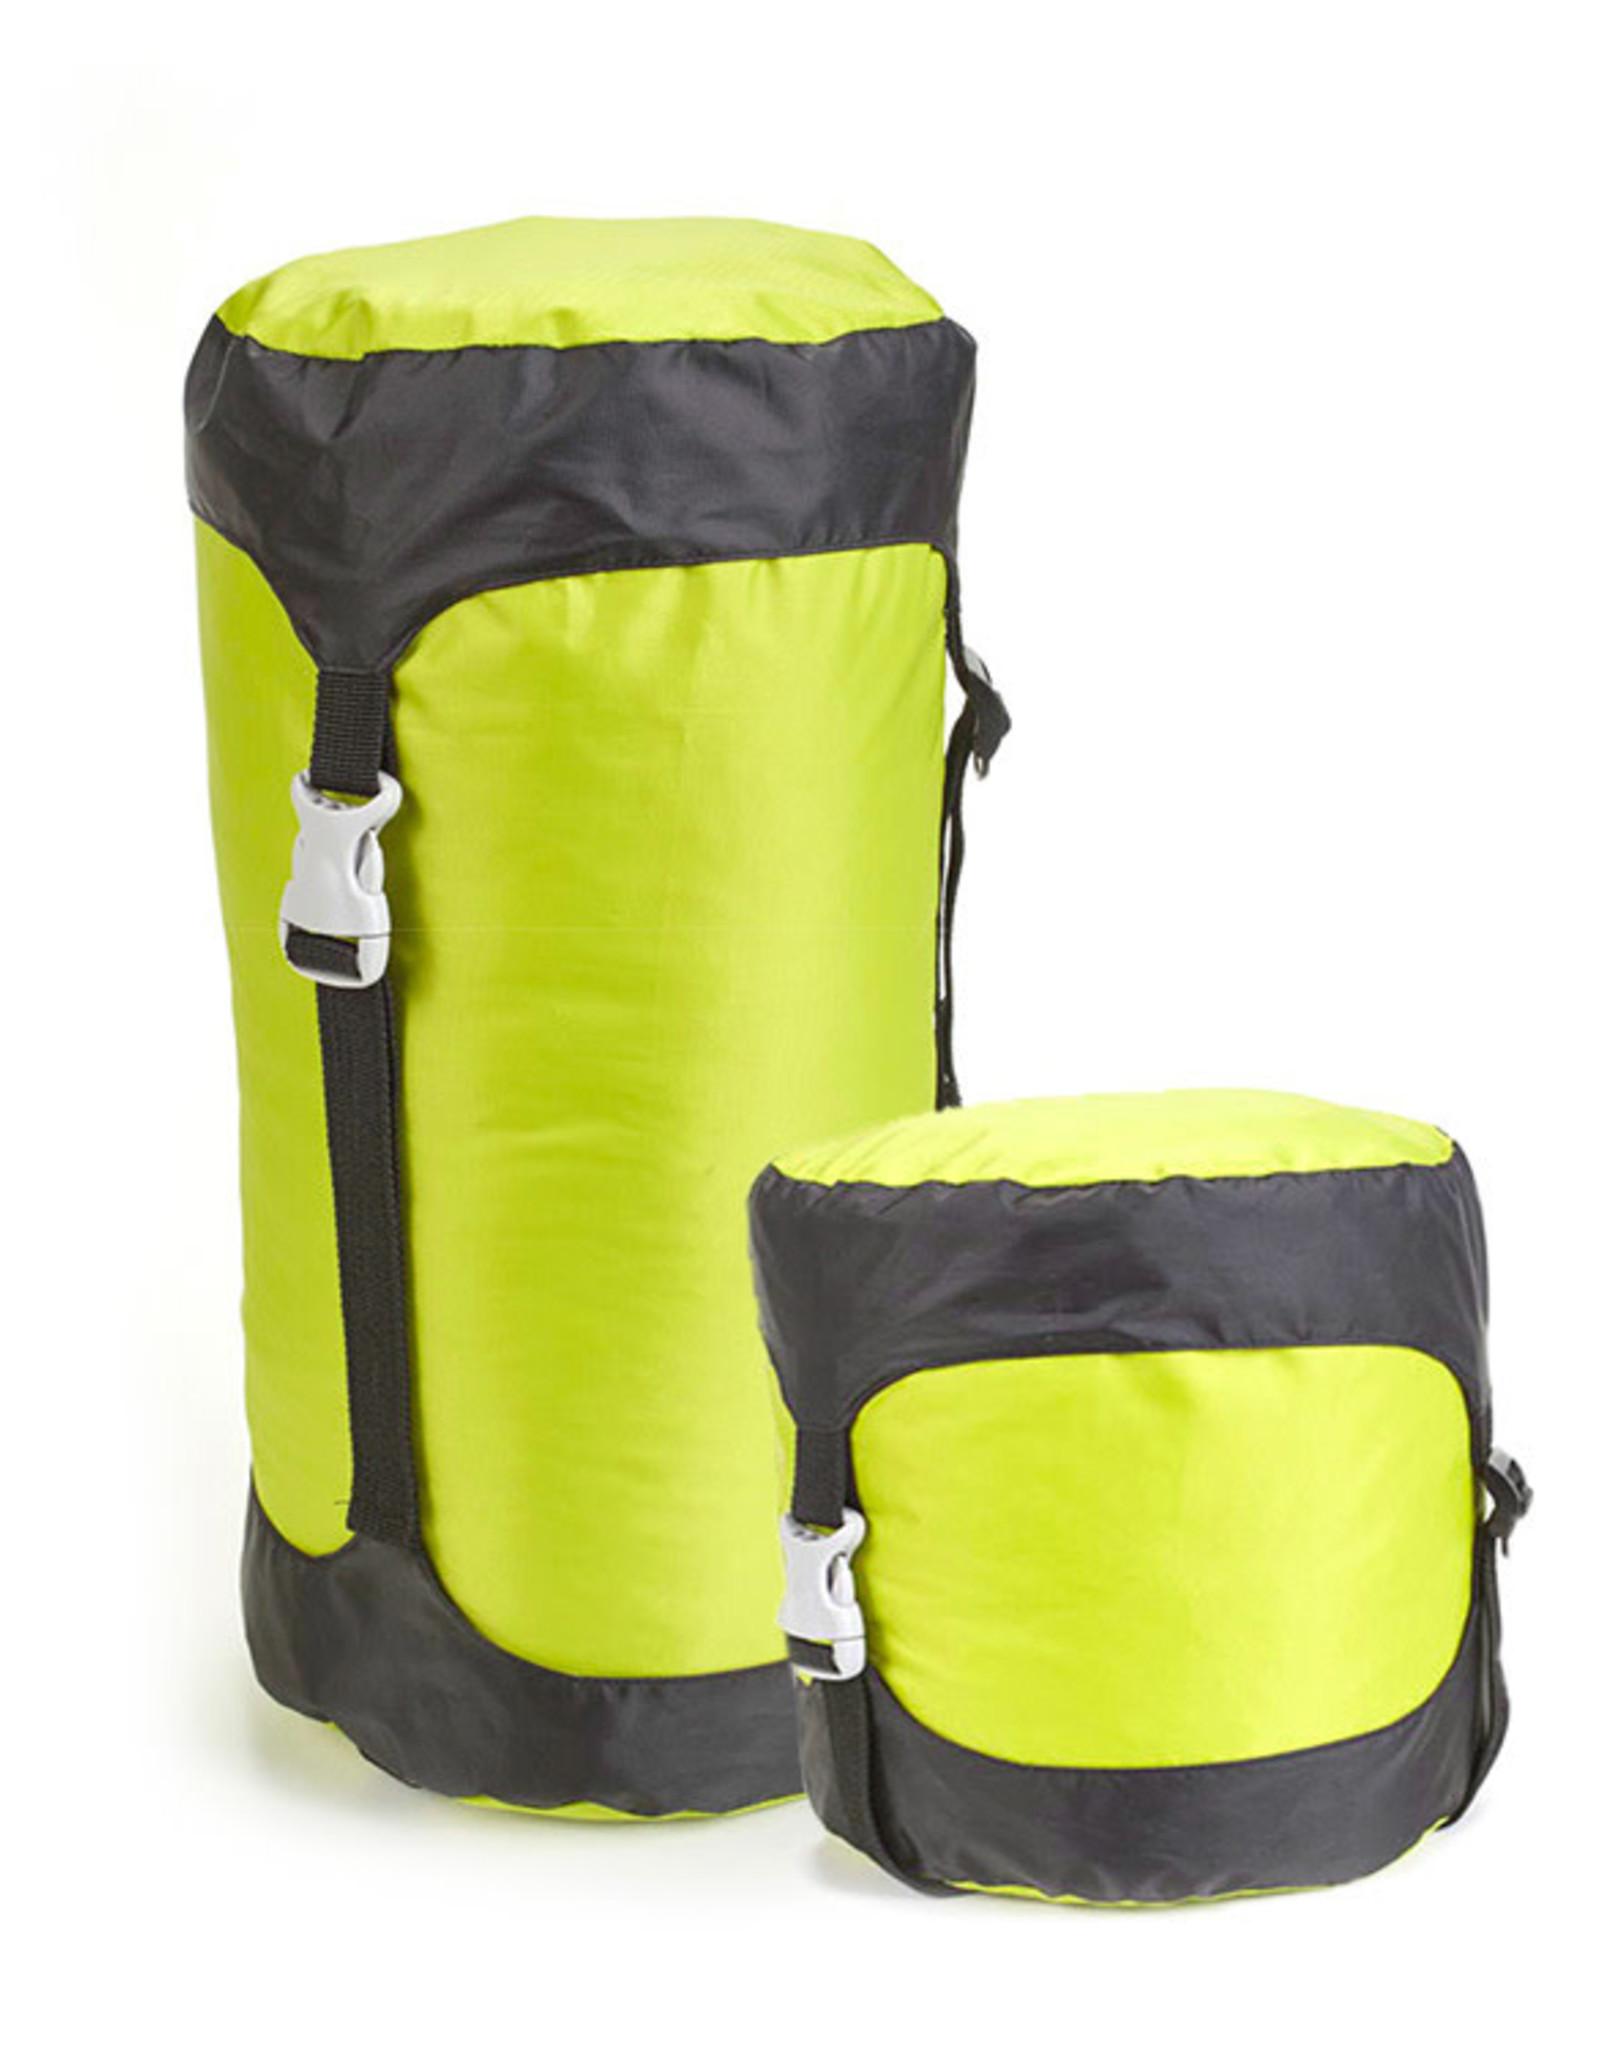 Hotcore Outdoor Products Hotcore BOA Compression Bag 10L